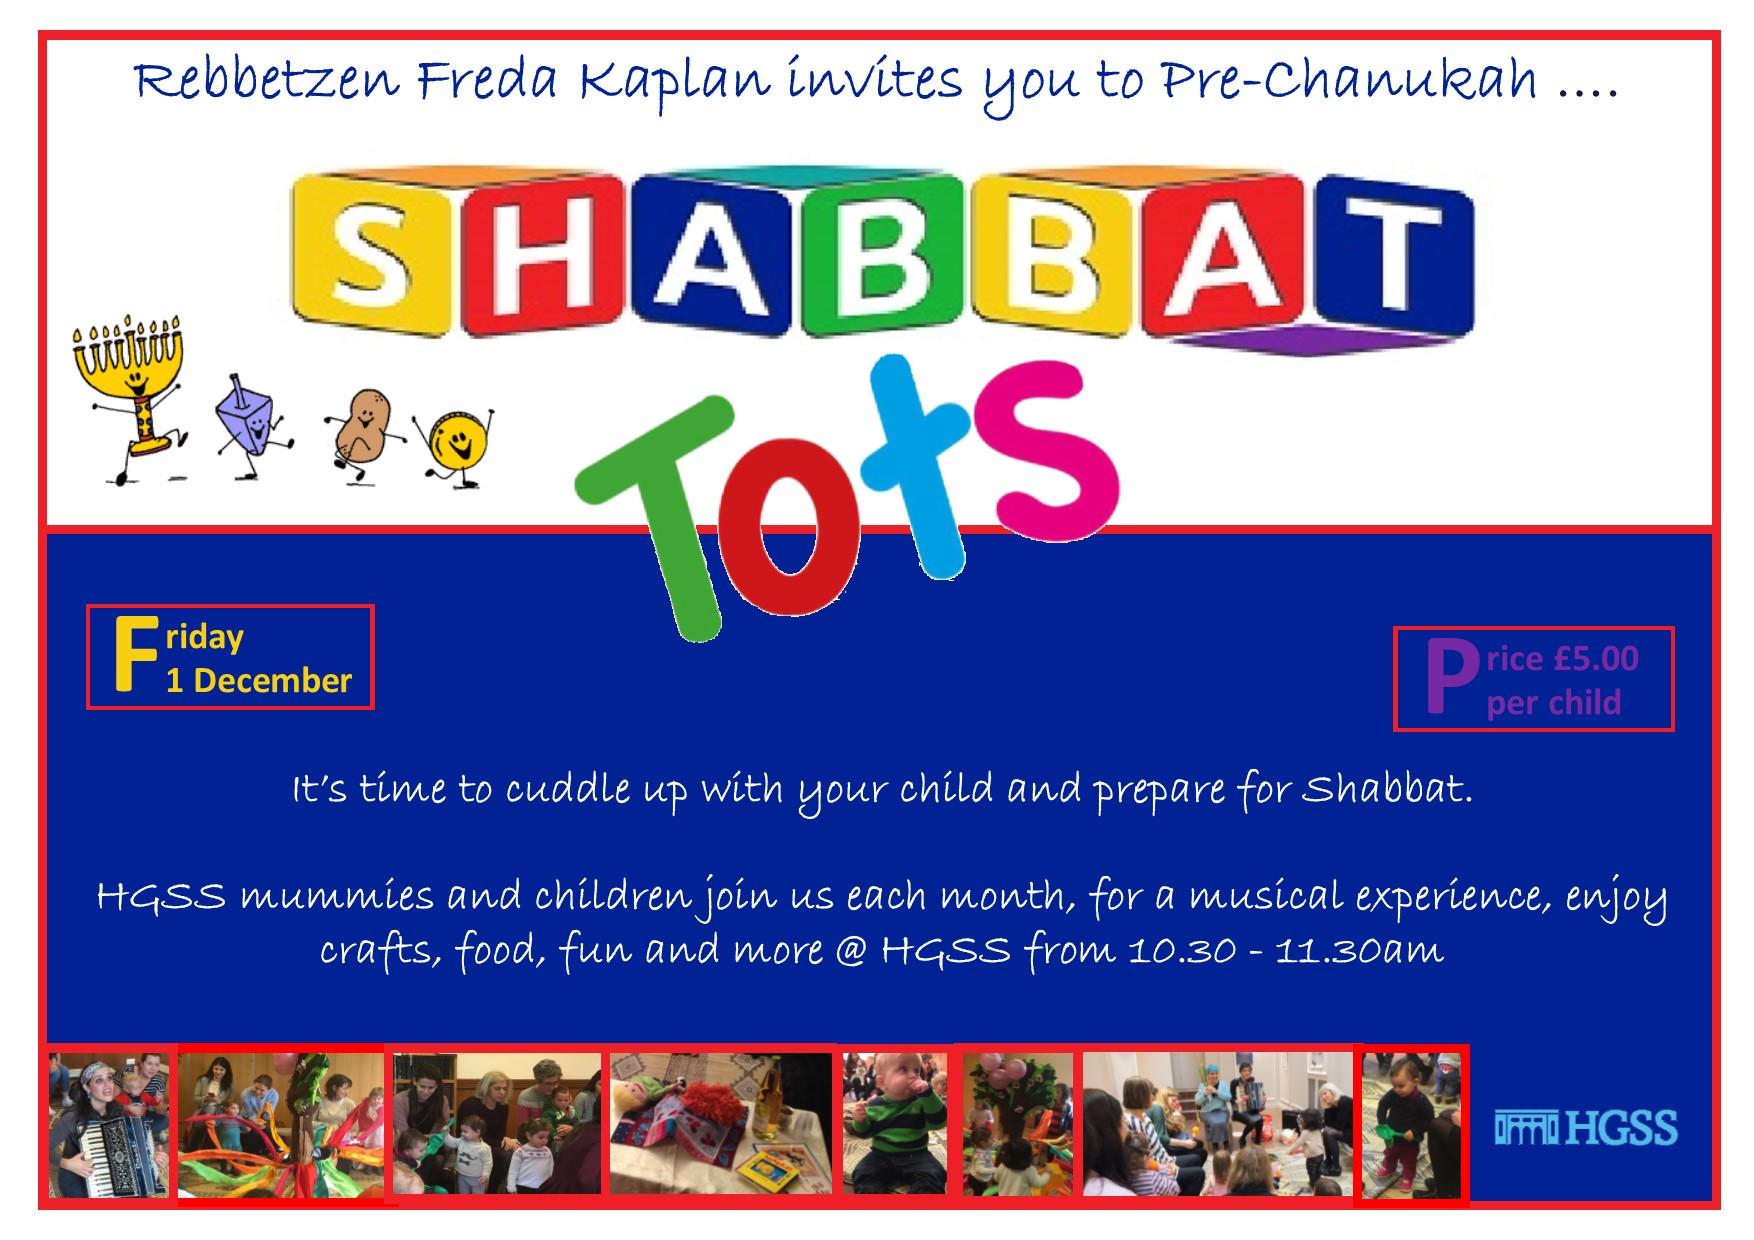 Shabbat Tots (Chanukah) @ Max Weinbaum Hall